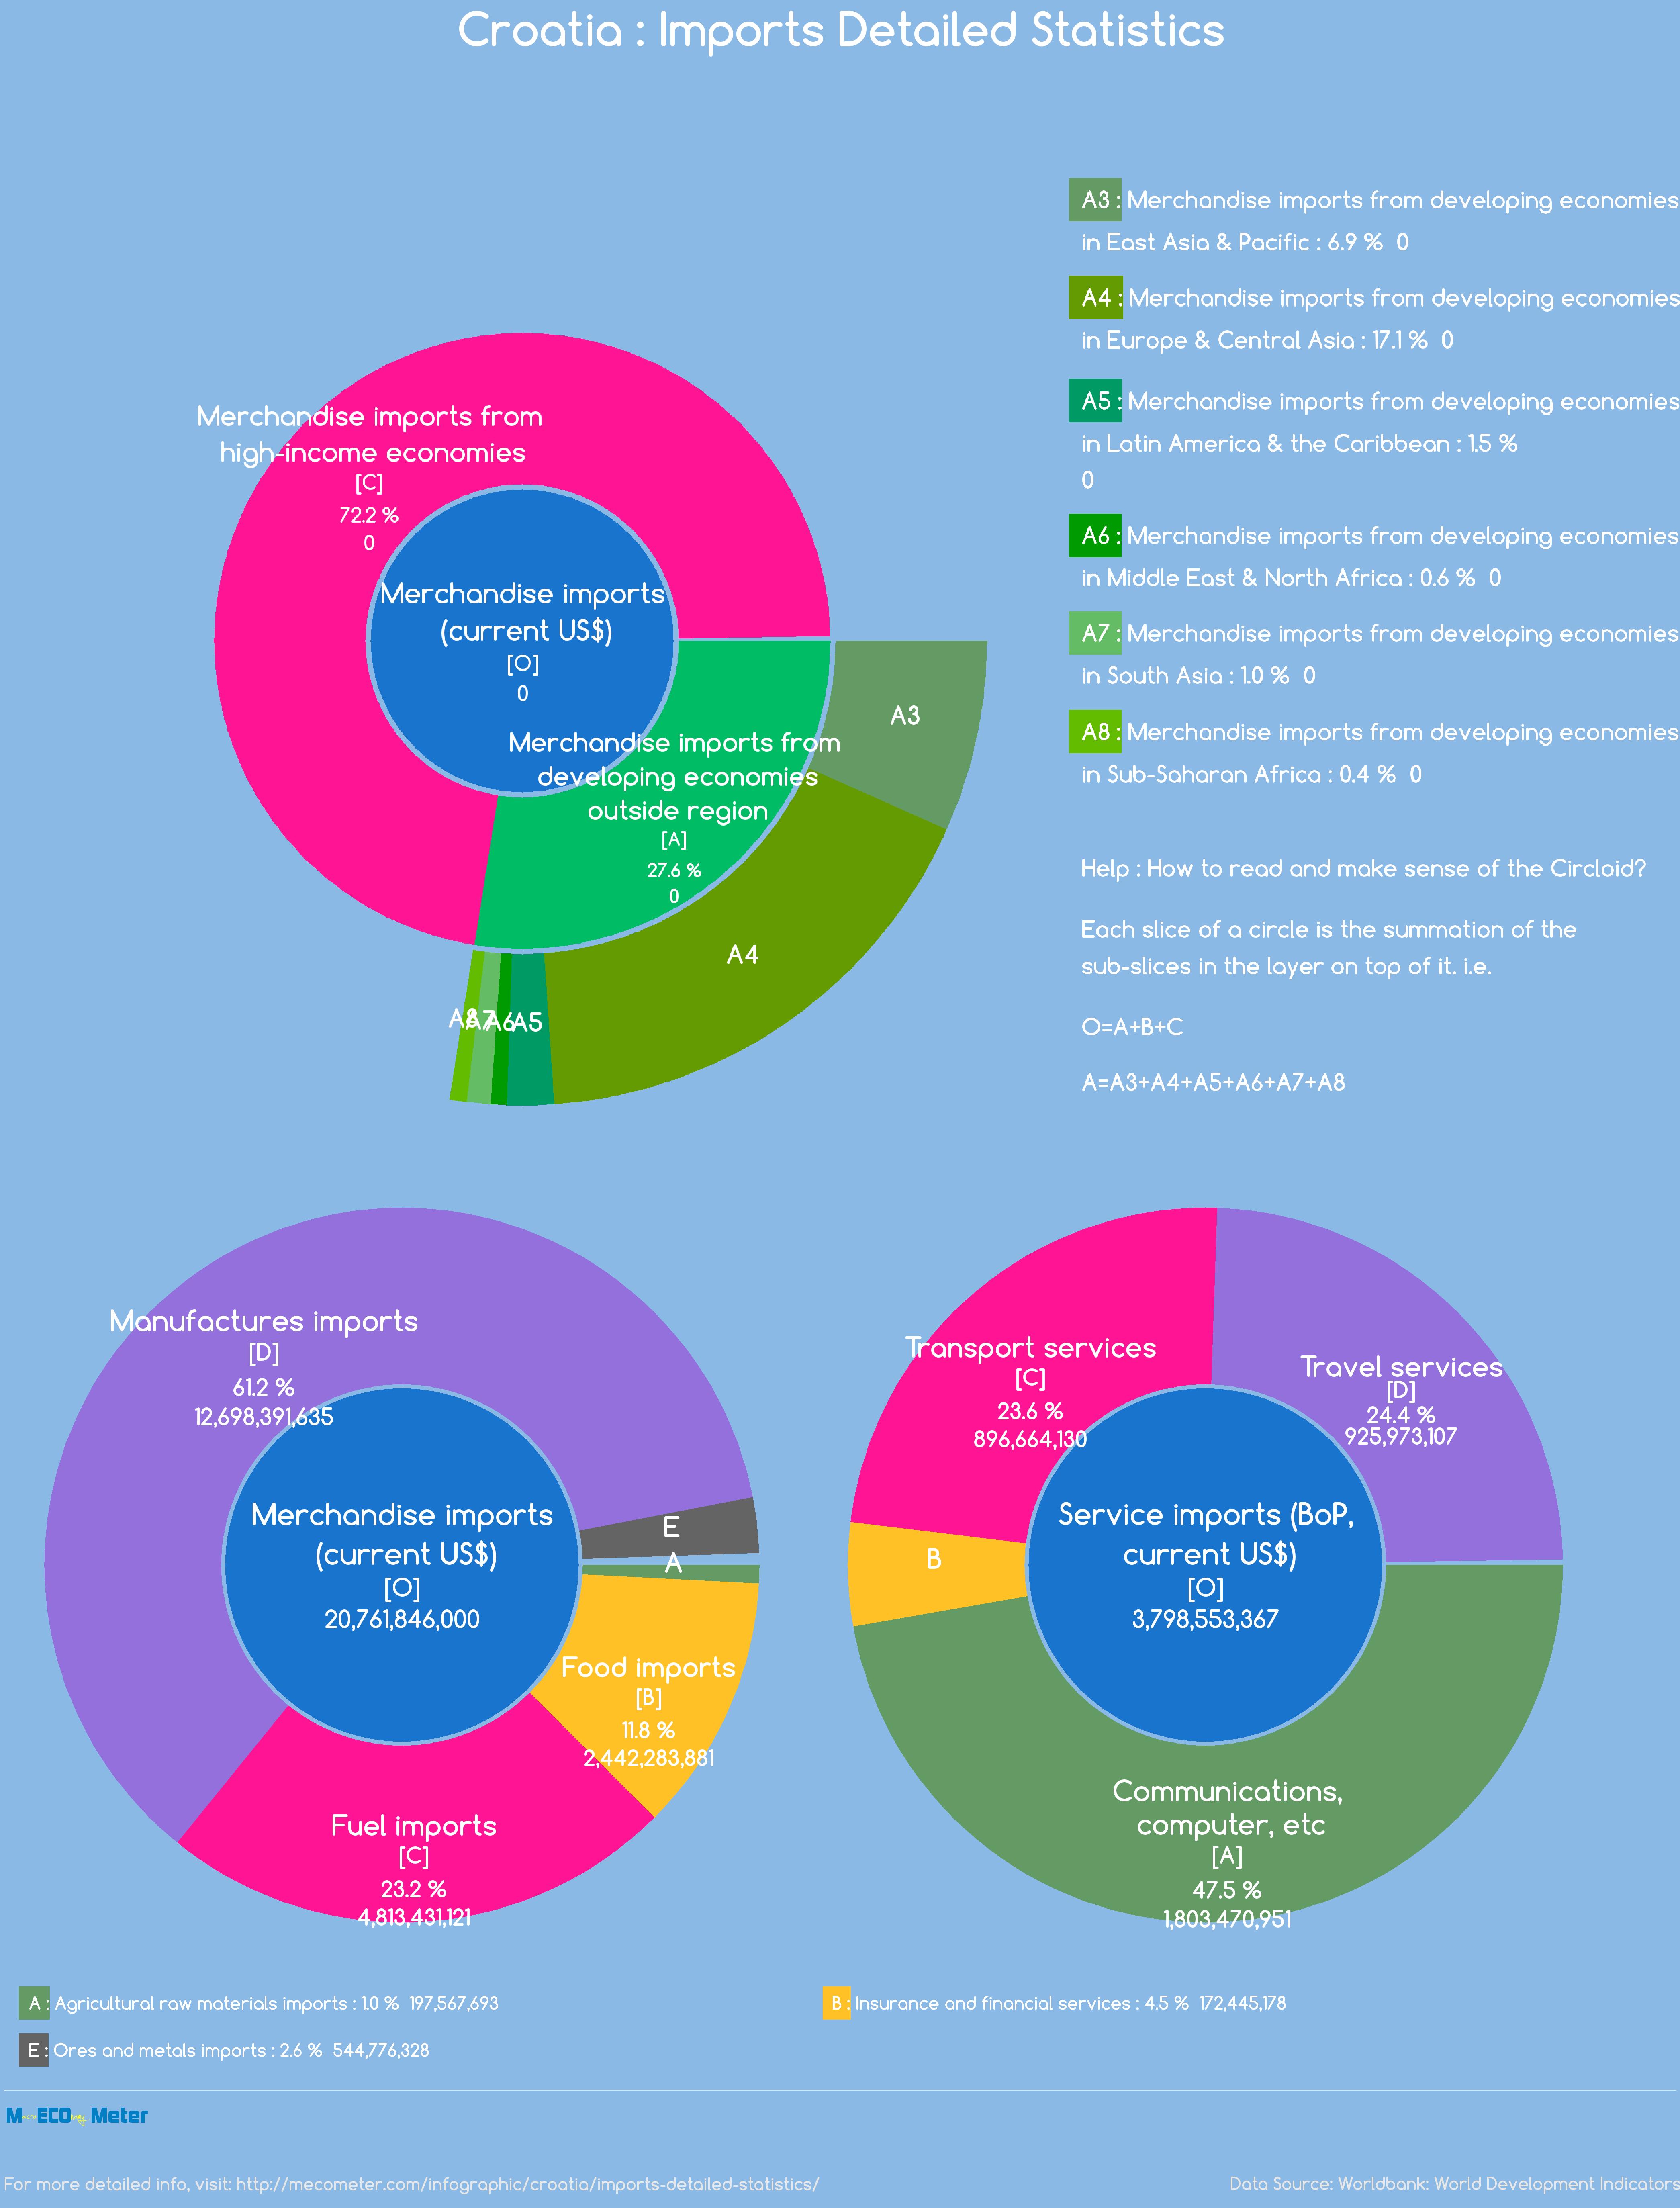 Croatia : Imports Detailed Statistics